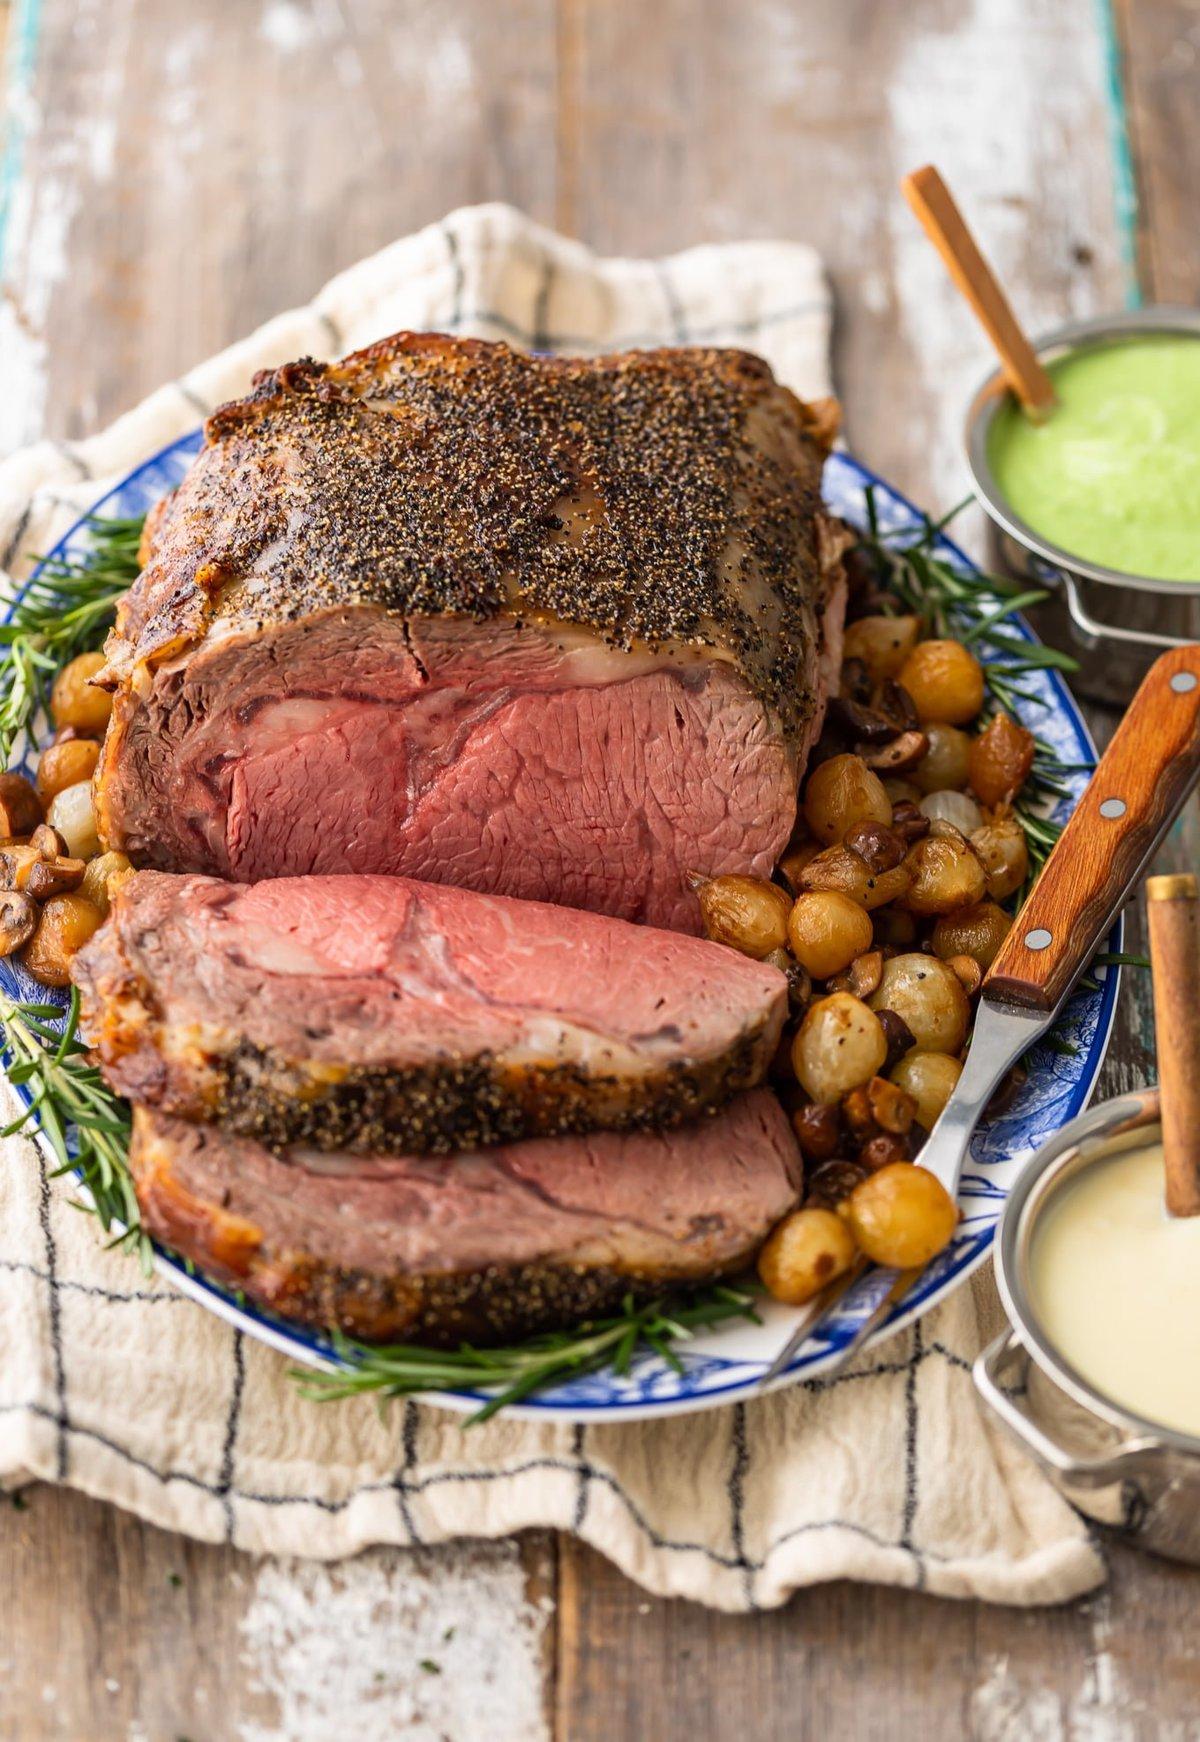 a plate of prime rib roast